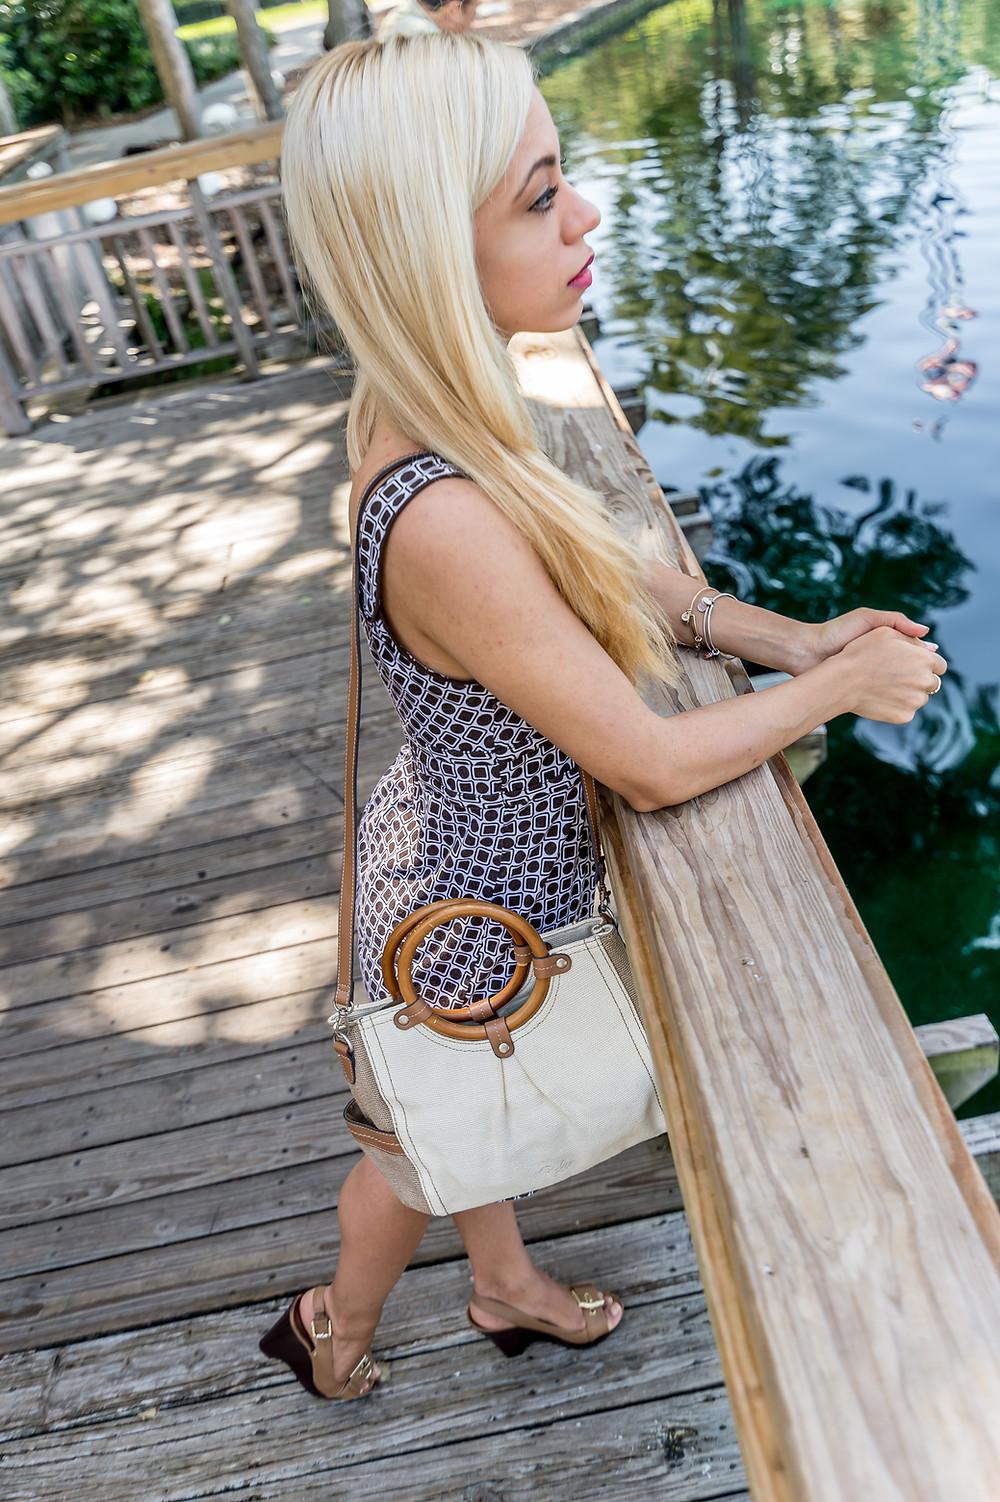 Katrina Belle - Katrina Belle Beauty - Orlando fashion blogger - Daniel Bastos Photography - Downtown Orlando - Lake Eola Park